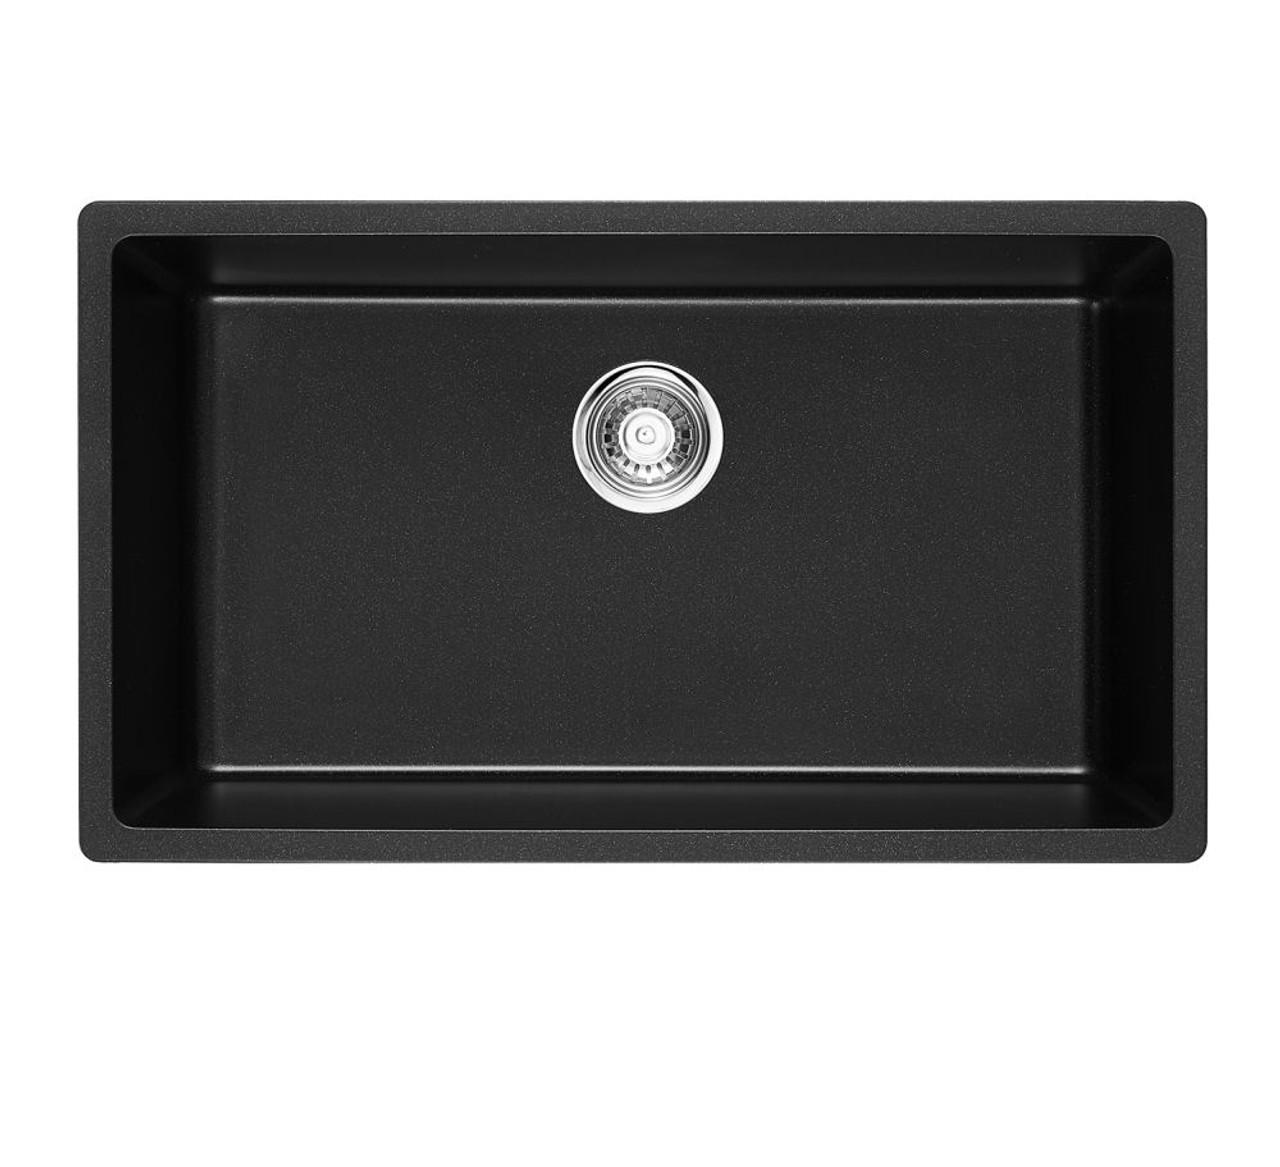 normandy granite kitchen sink under mount drop in single bowl 780x440